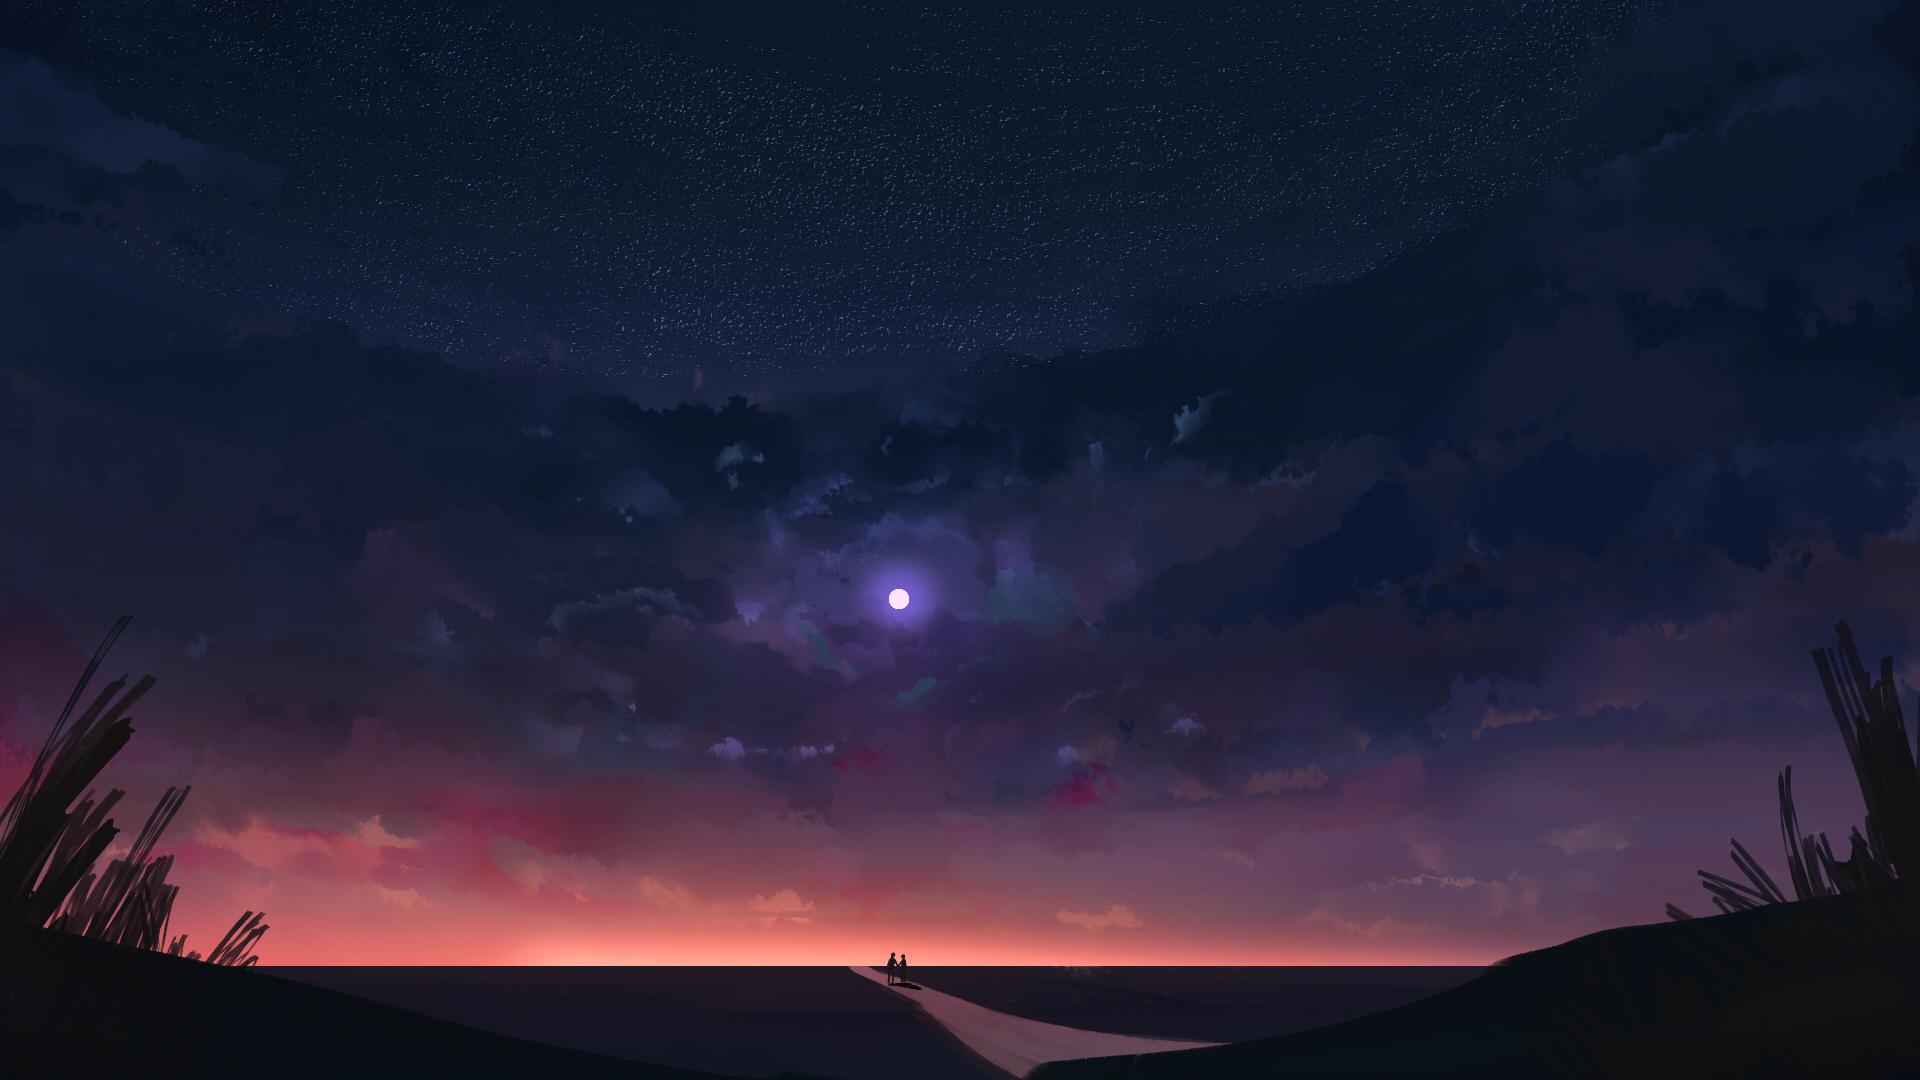 Digital Art Illustration Artwork Night Moon Clouds Sky Couple Stars DeviantArt Concept Art 1920x1080